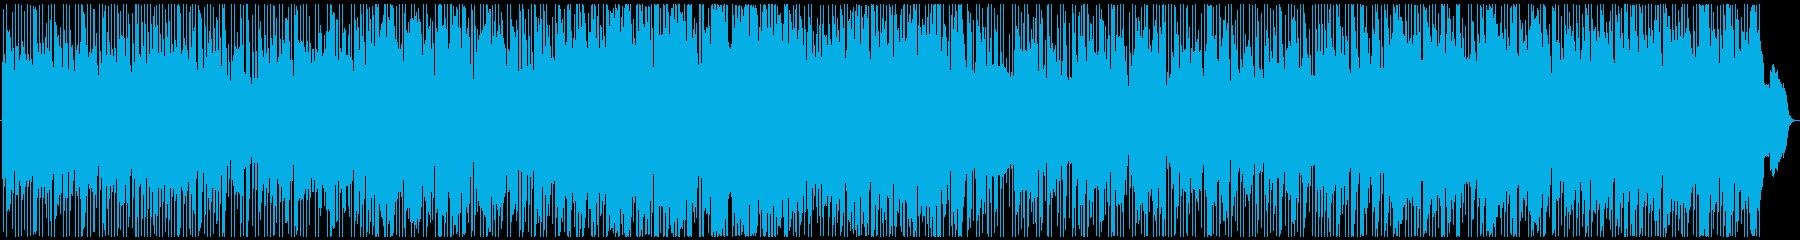 bosanobaの再生済みの波形